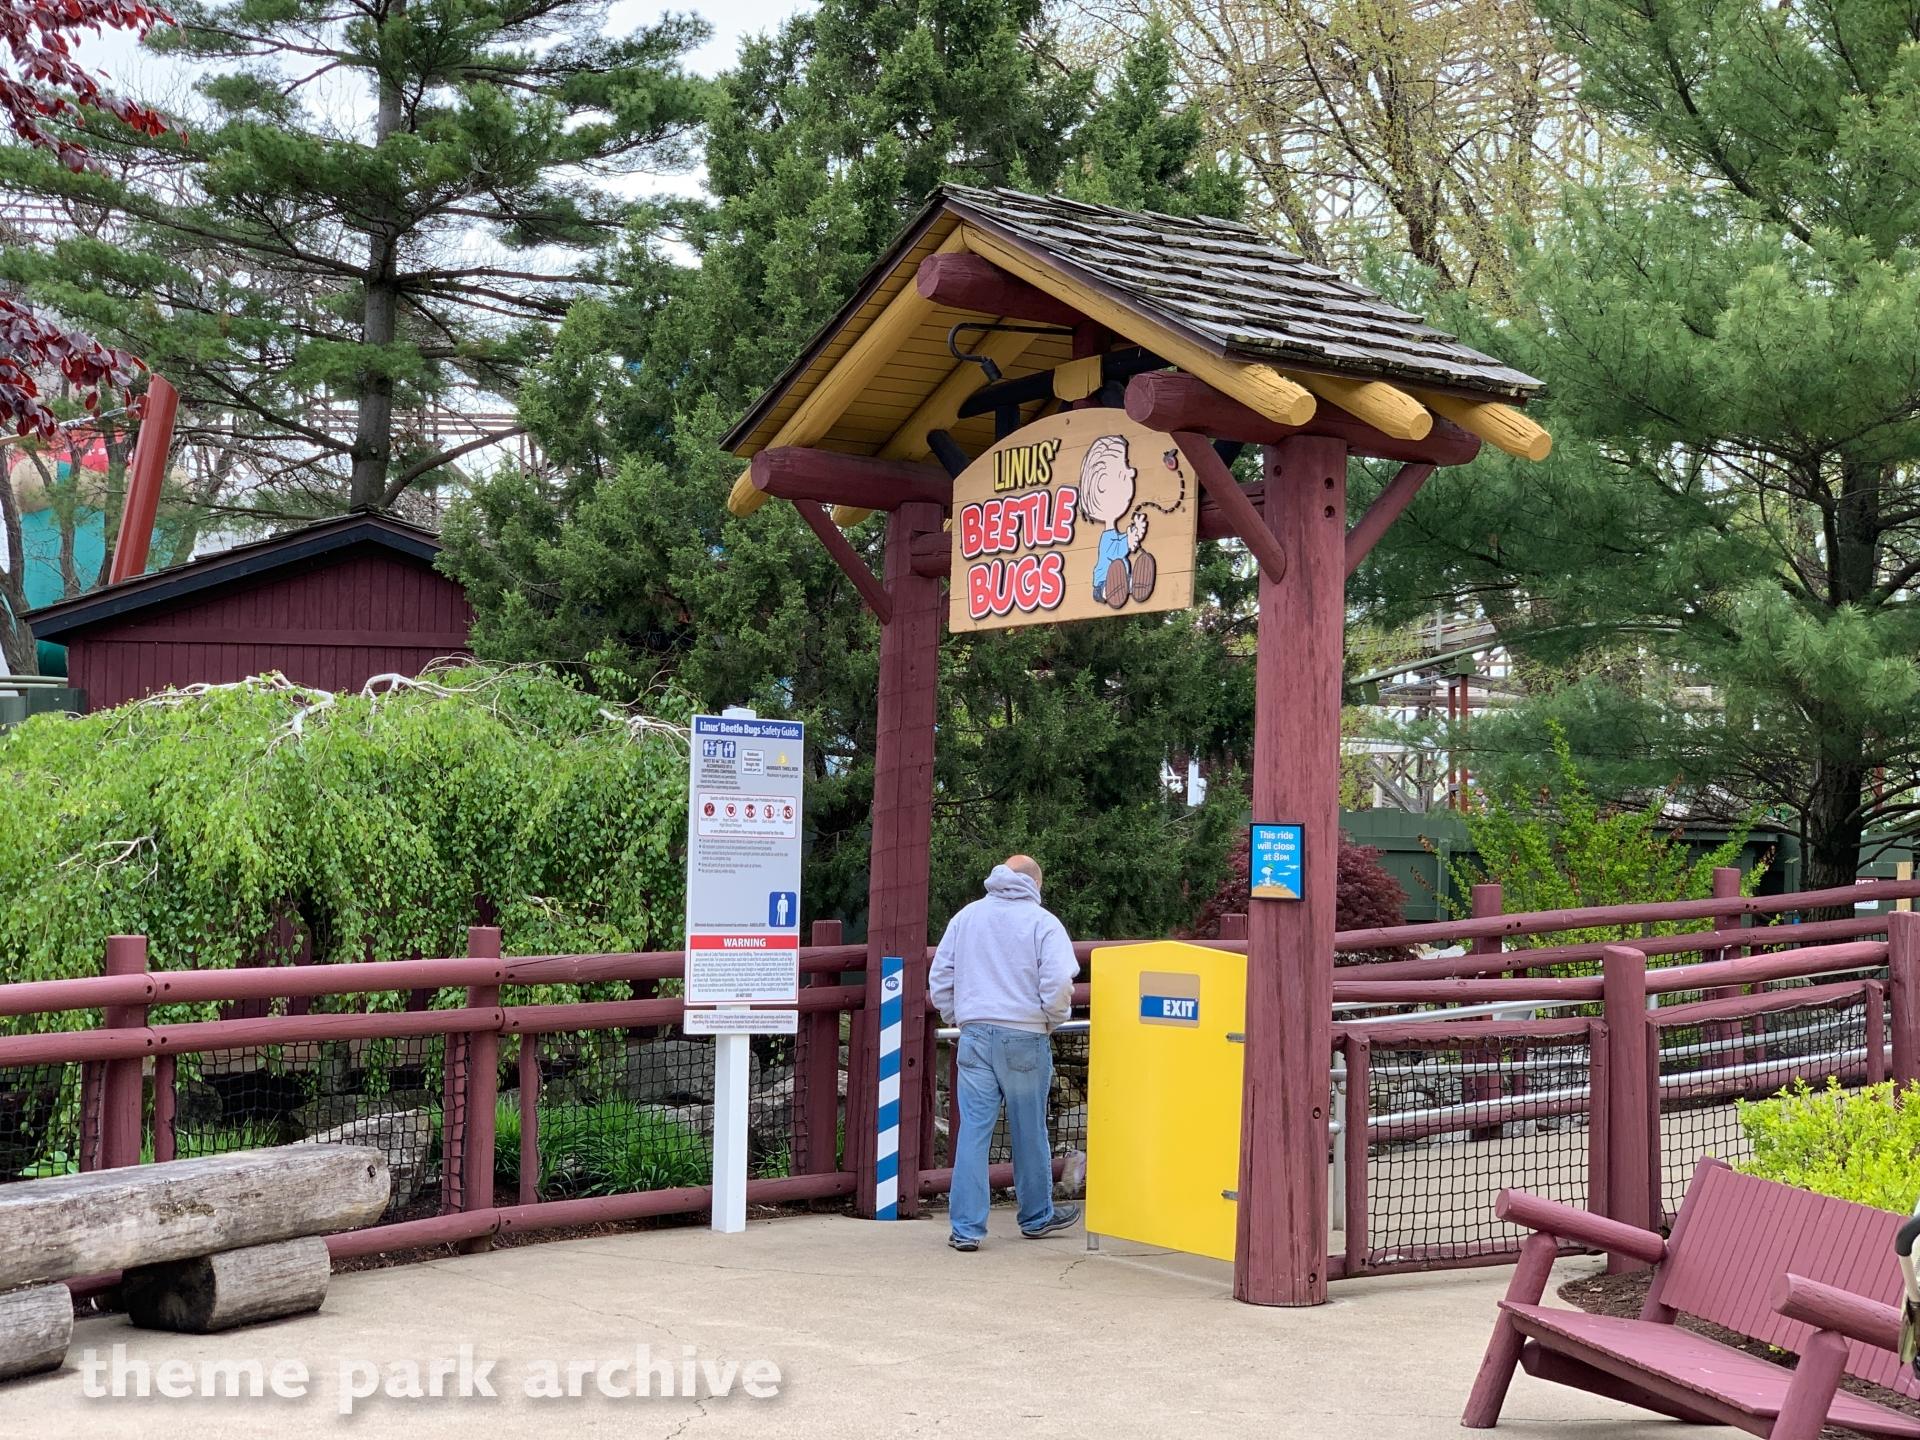 Linus Beetle Bugs at Cedar Point